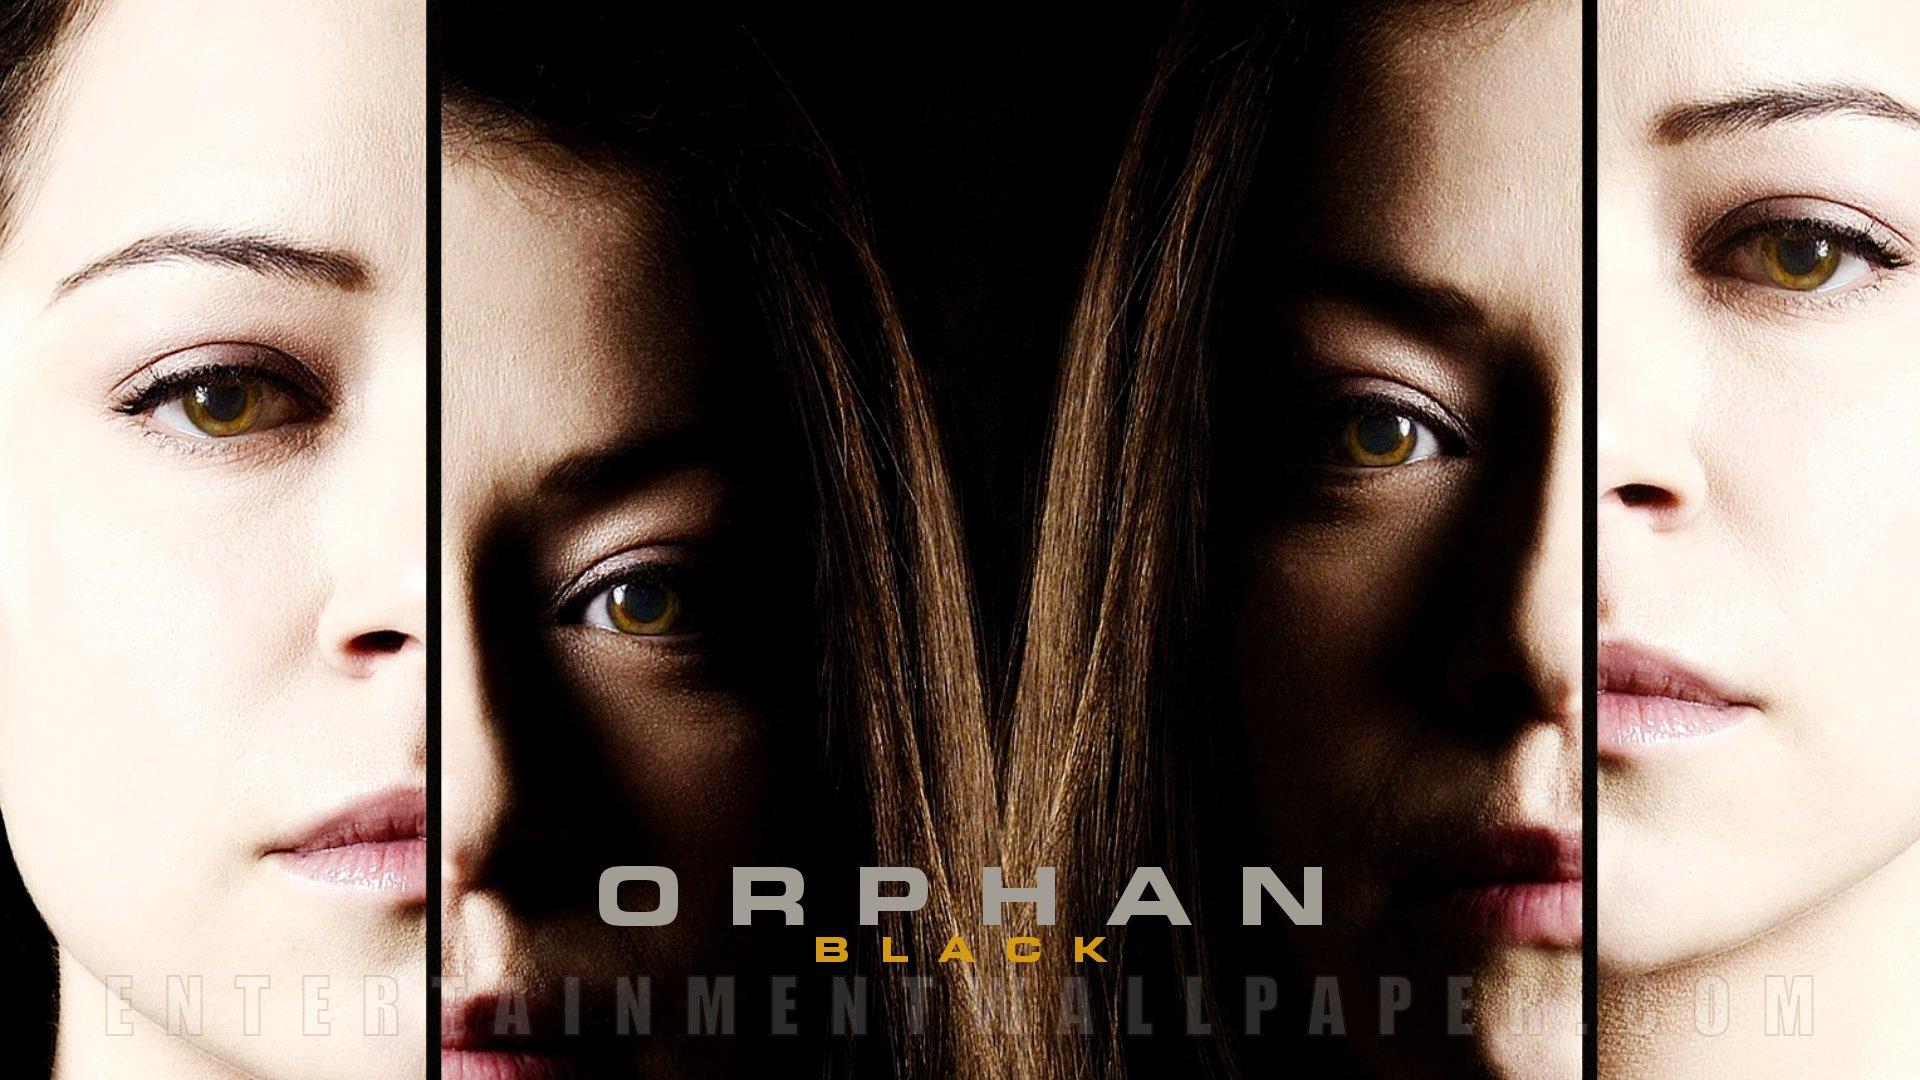 Orphan Black 바탕화면